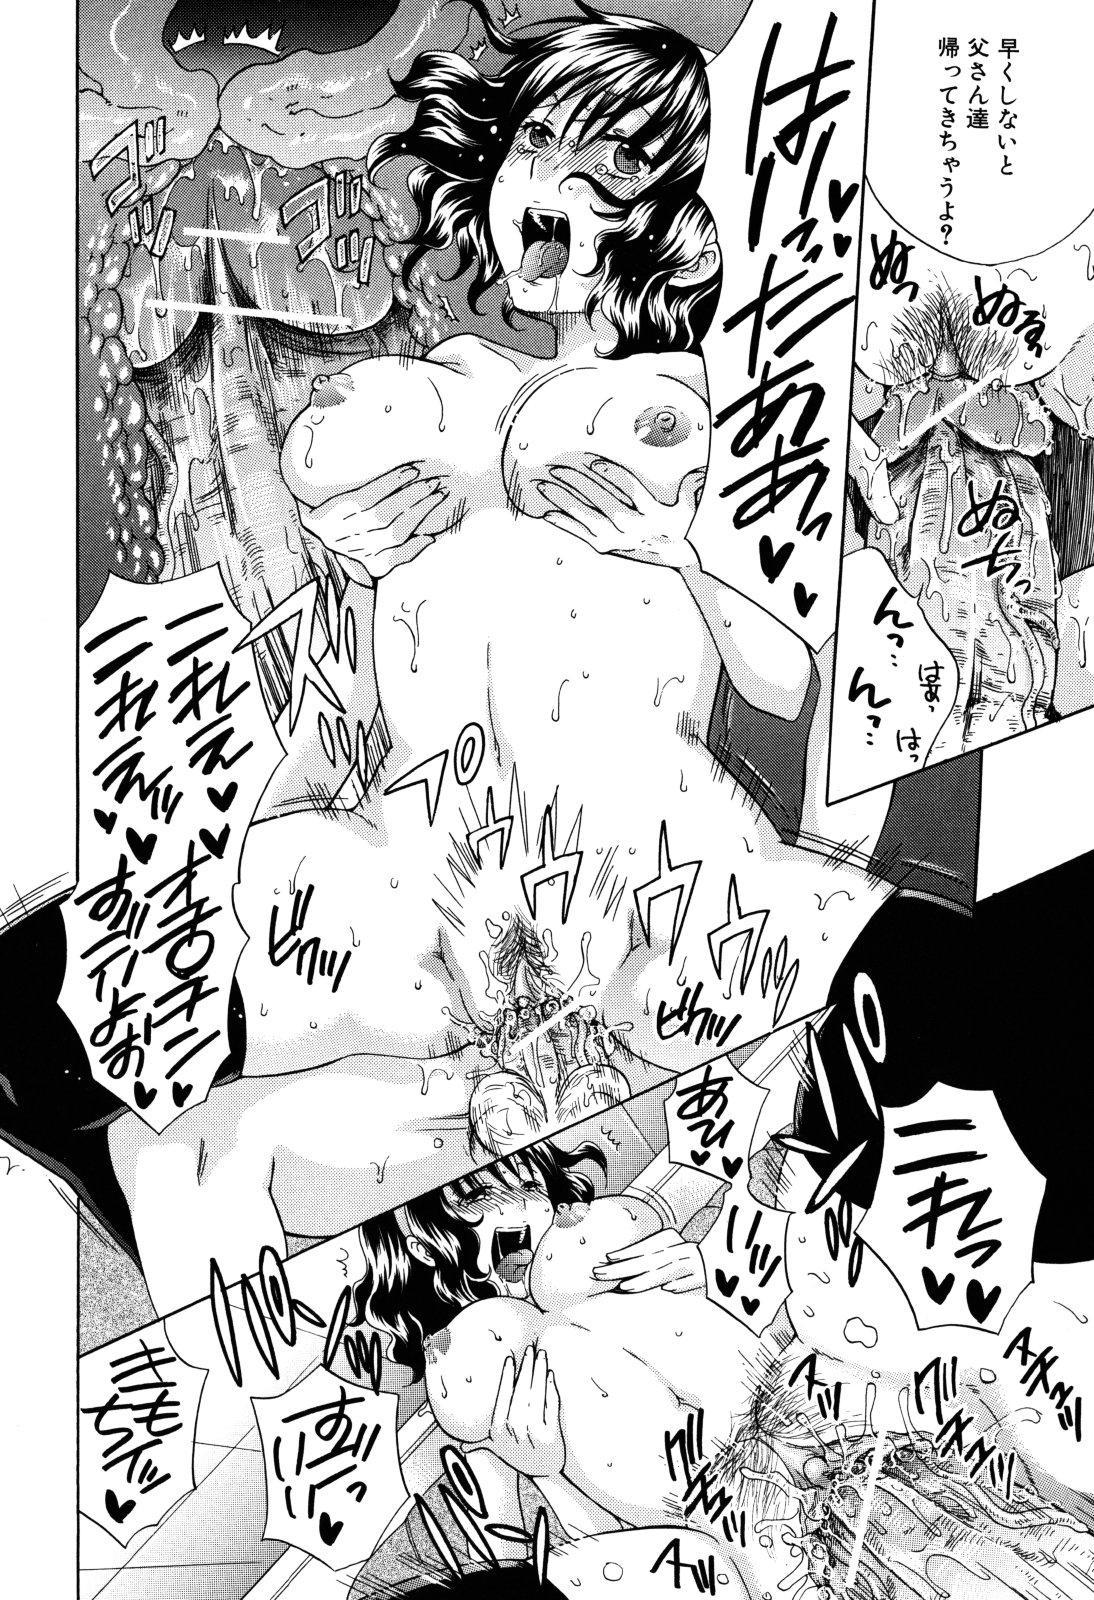 Kanojo ga Ochiru made - She in the depth 21